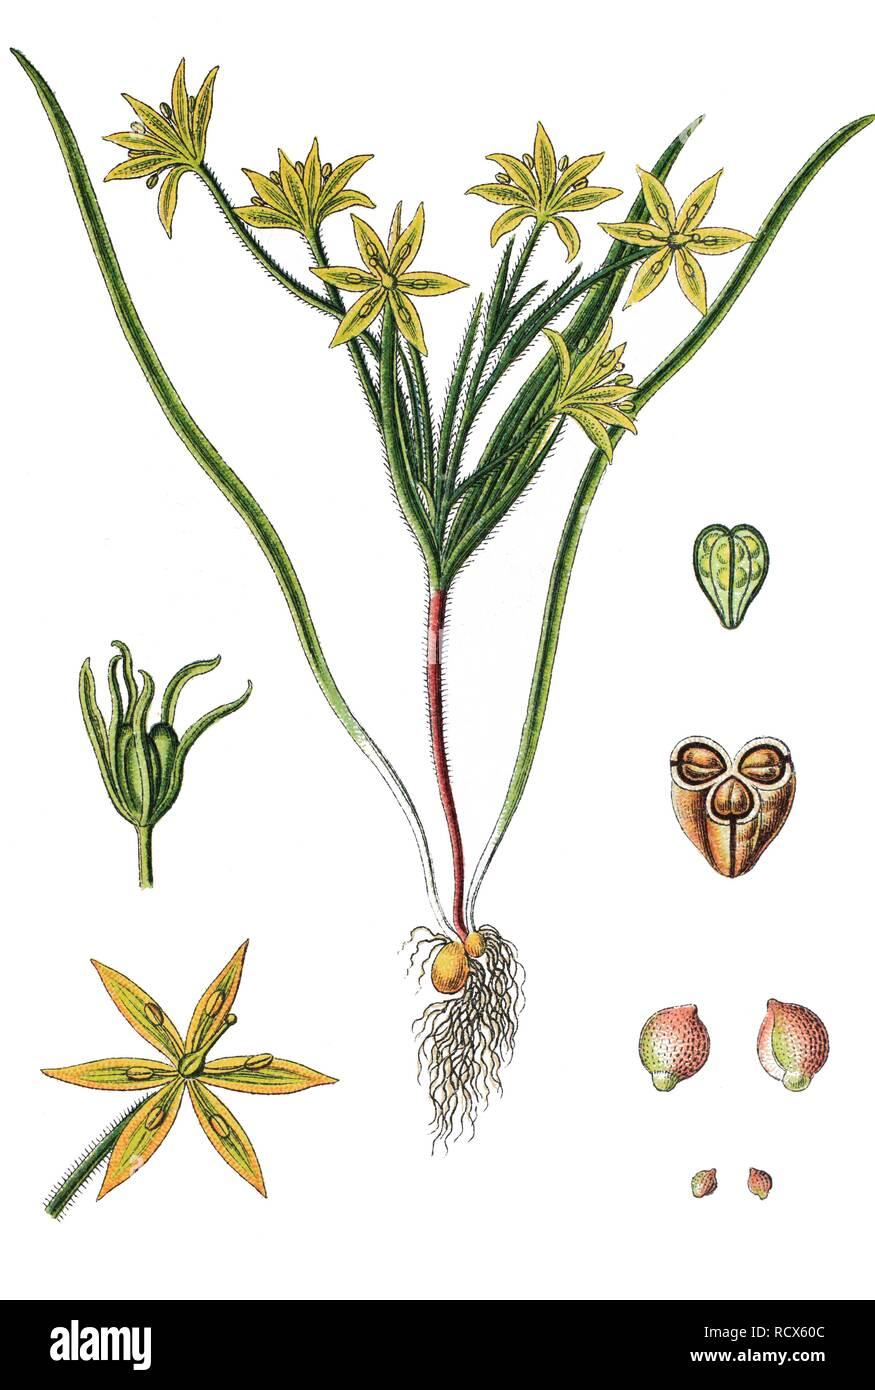 Field Gagea (Gagea villosa), medicinal plant, useful plant, chromolithograph, 1876 Stock Photo